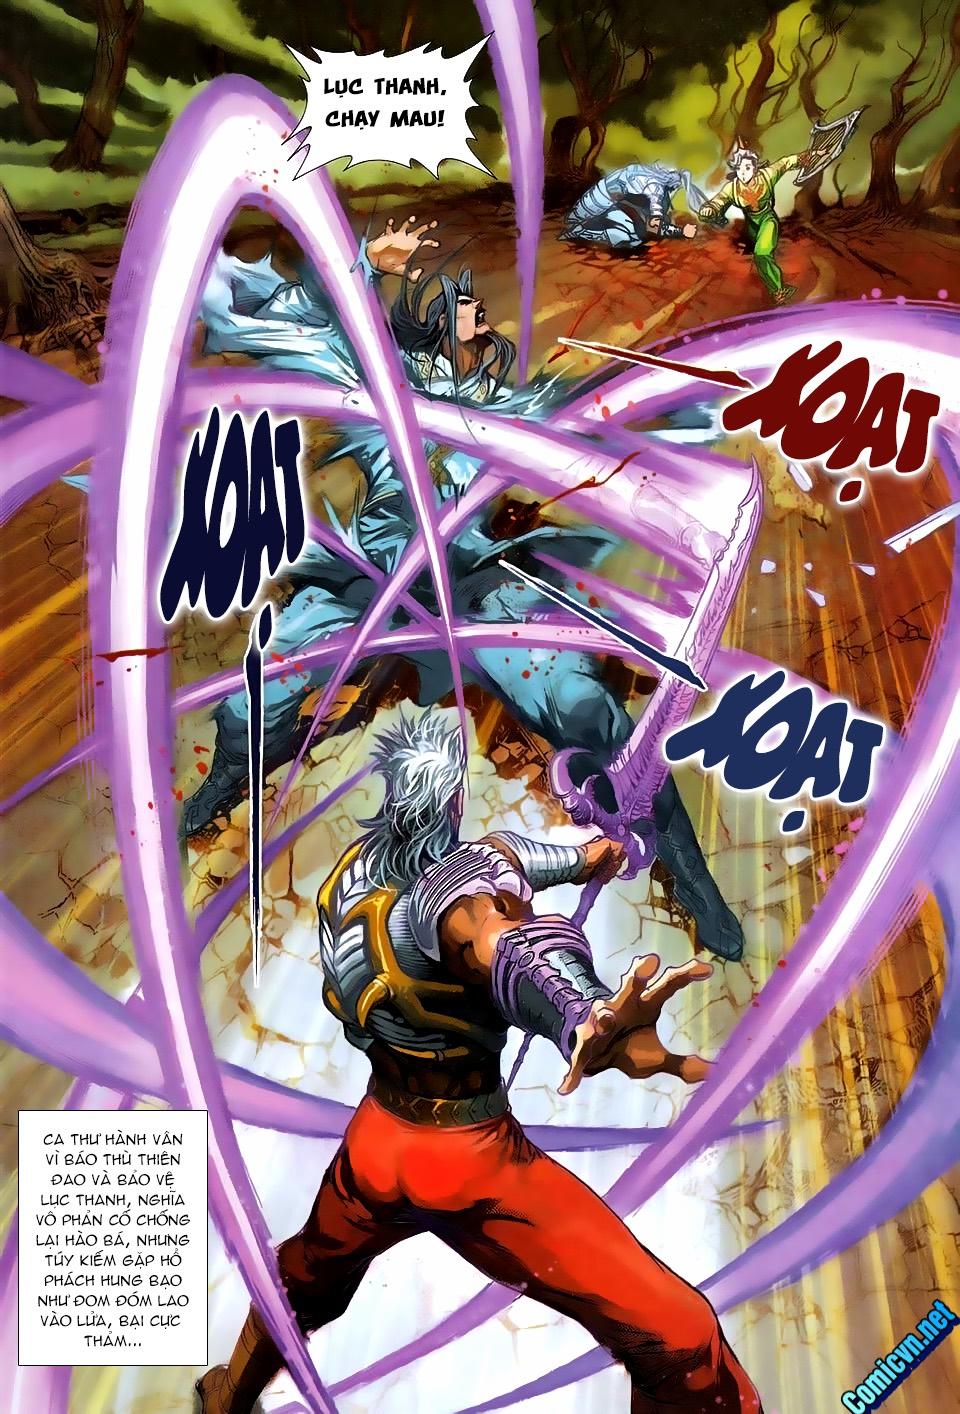 Thần binh huyền kỳ 3 - 3.5 Chapter 98 - Hamtruyen.vn